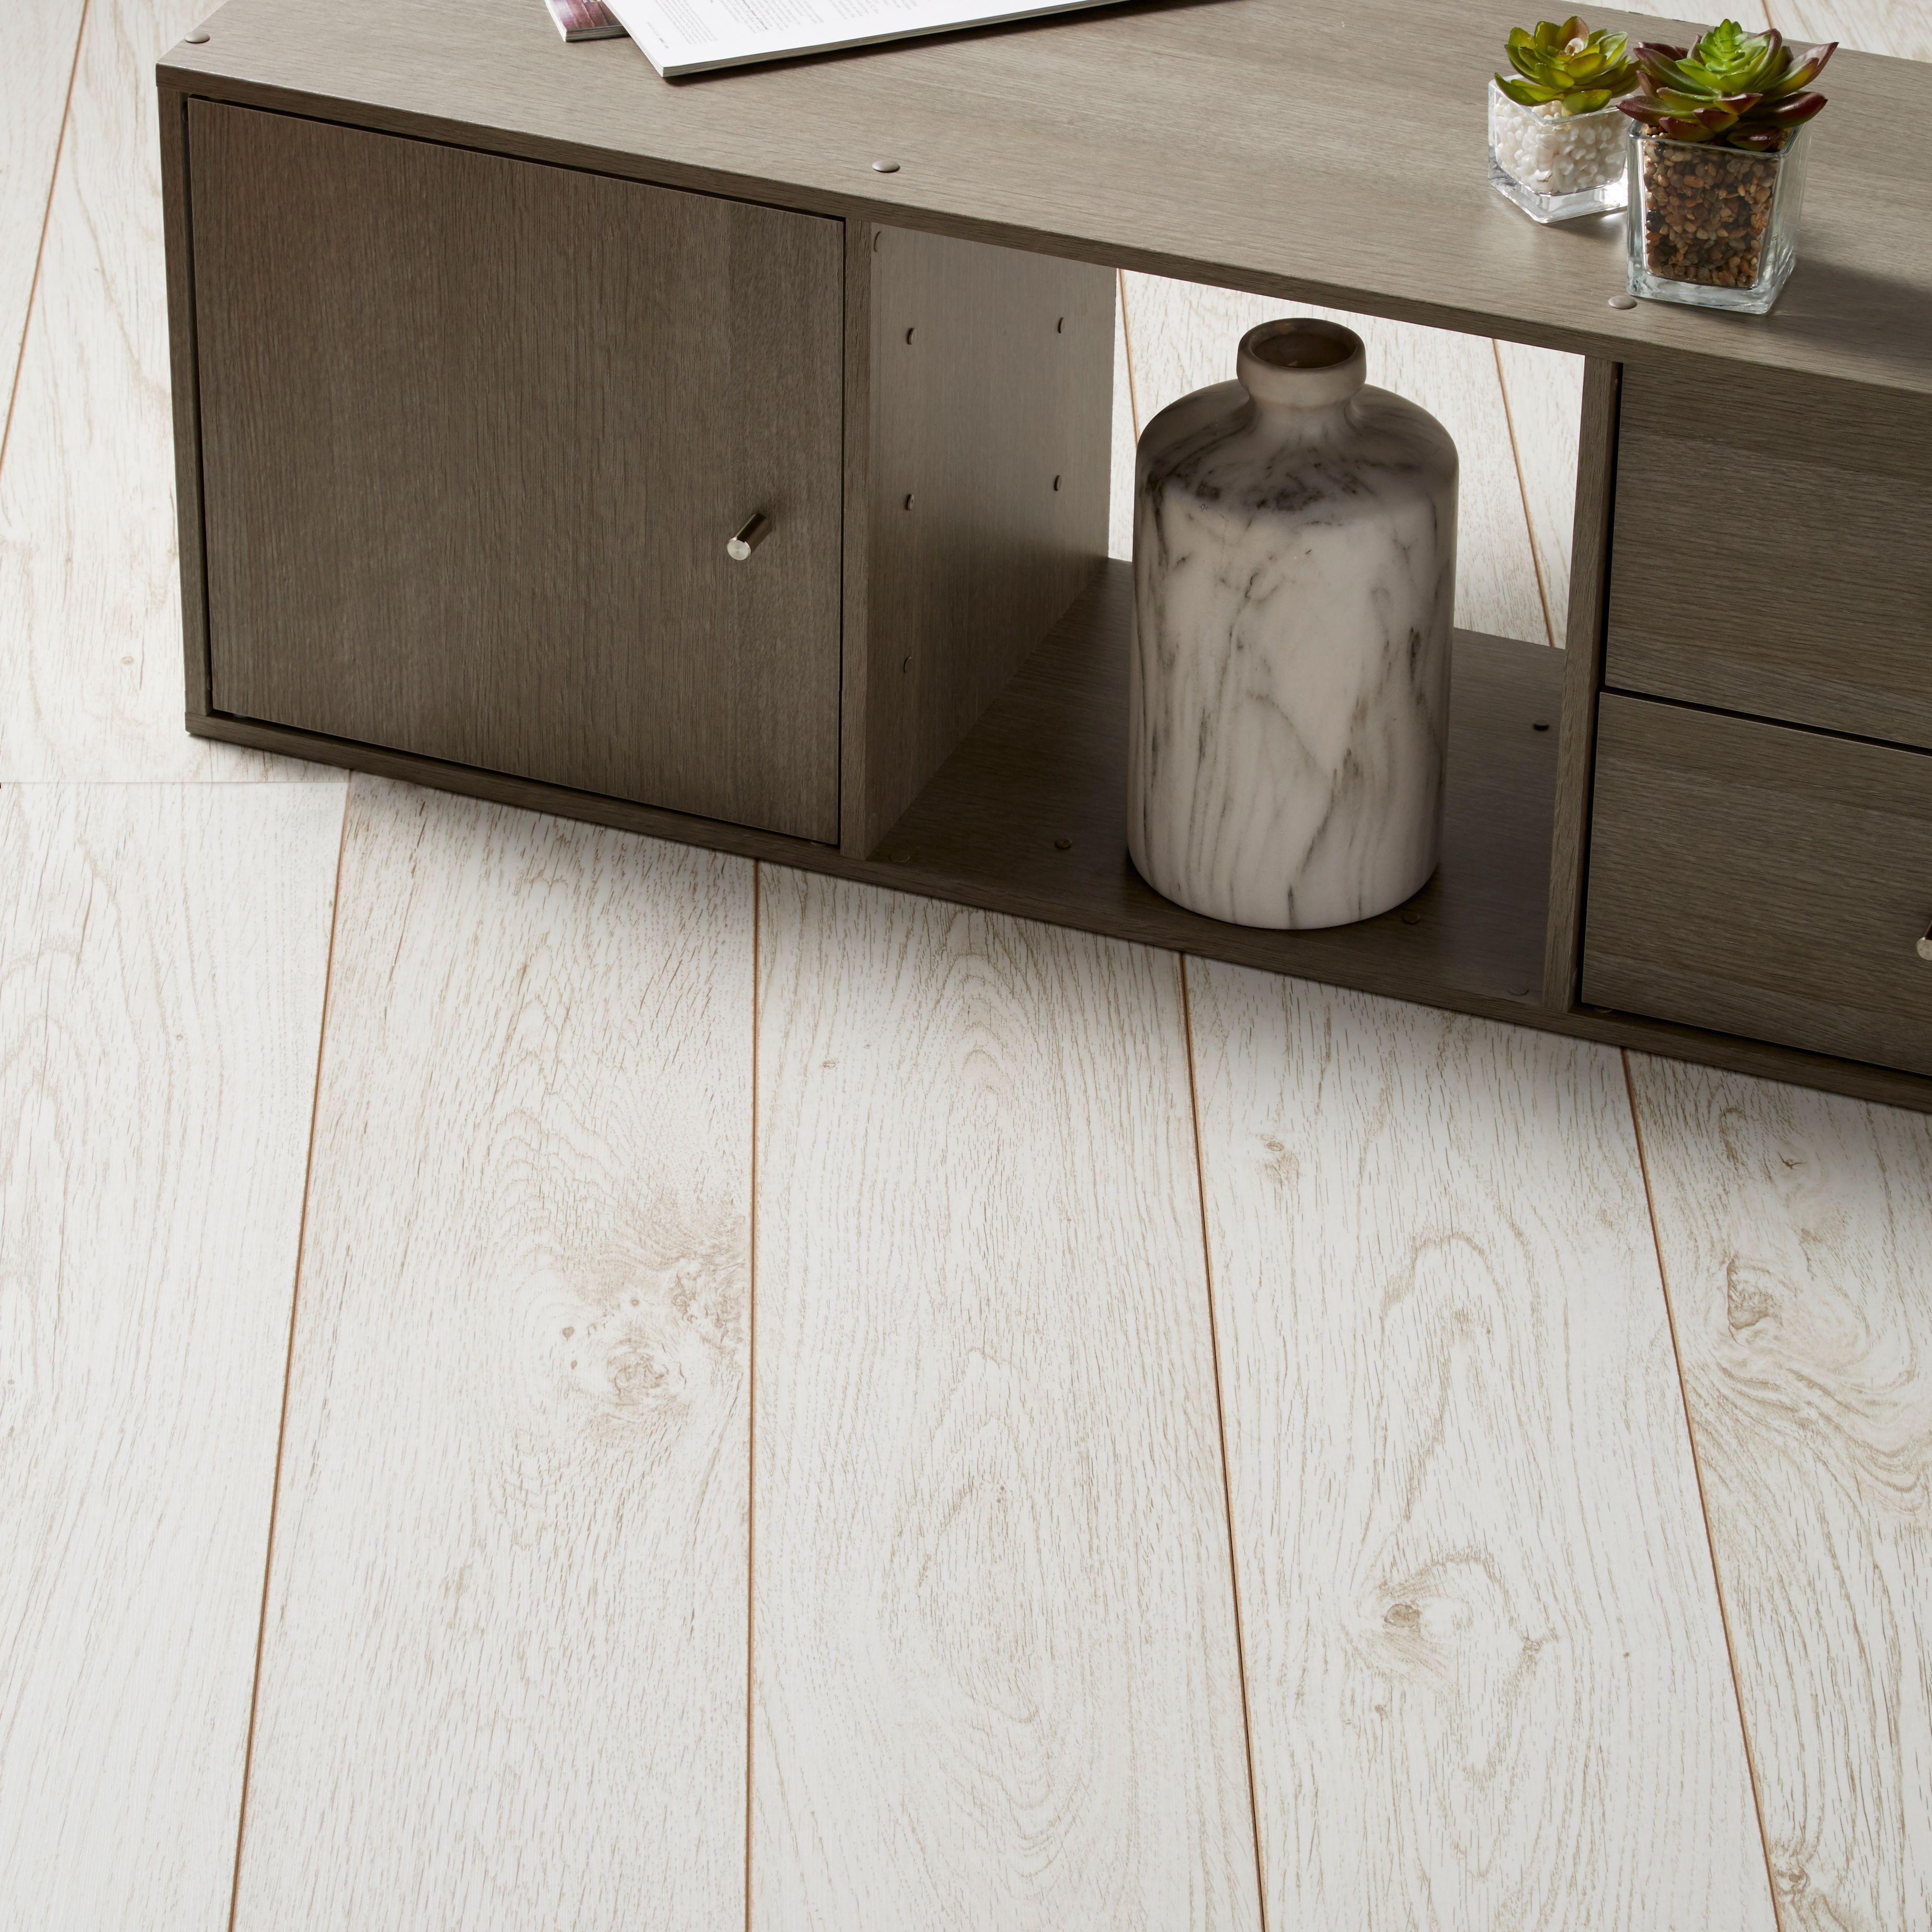 Gympie White Oak Effect Laminate Flooring Sample 1 996 M²